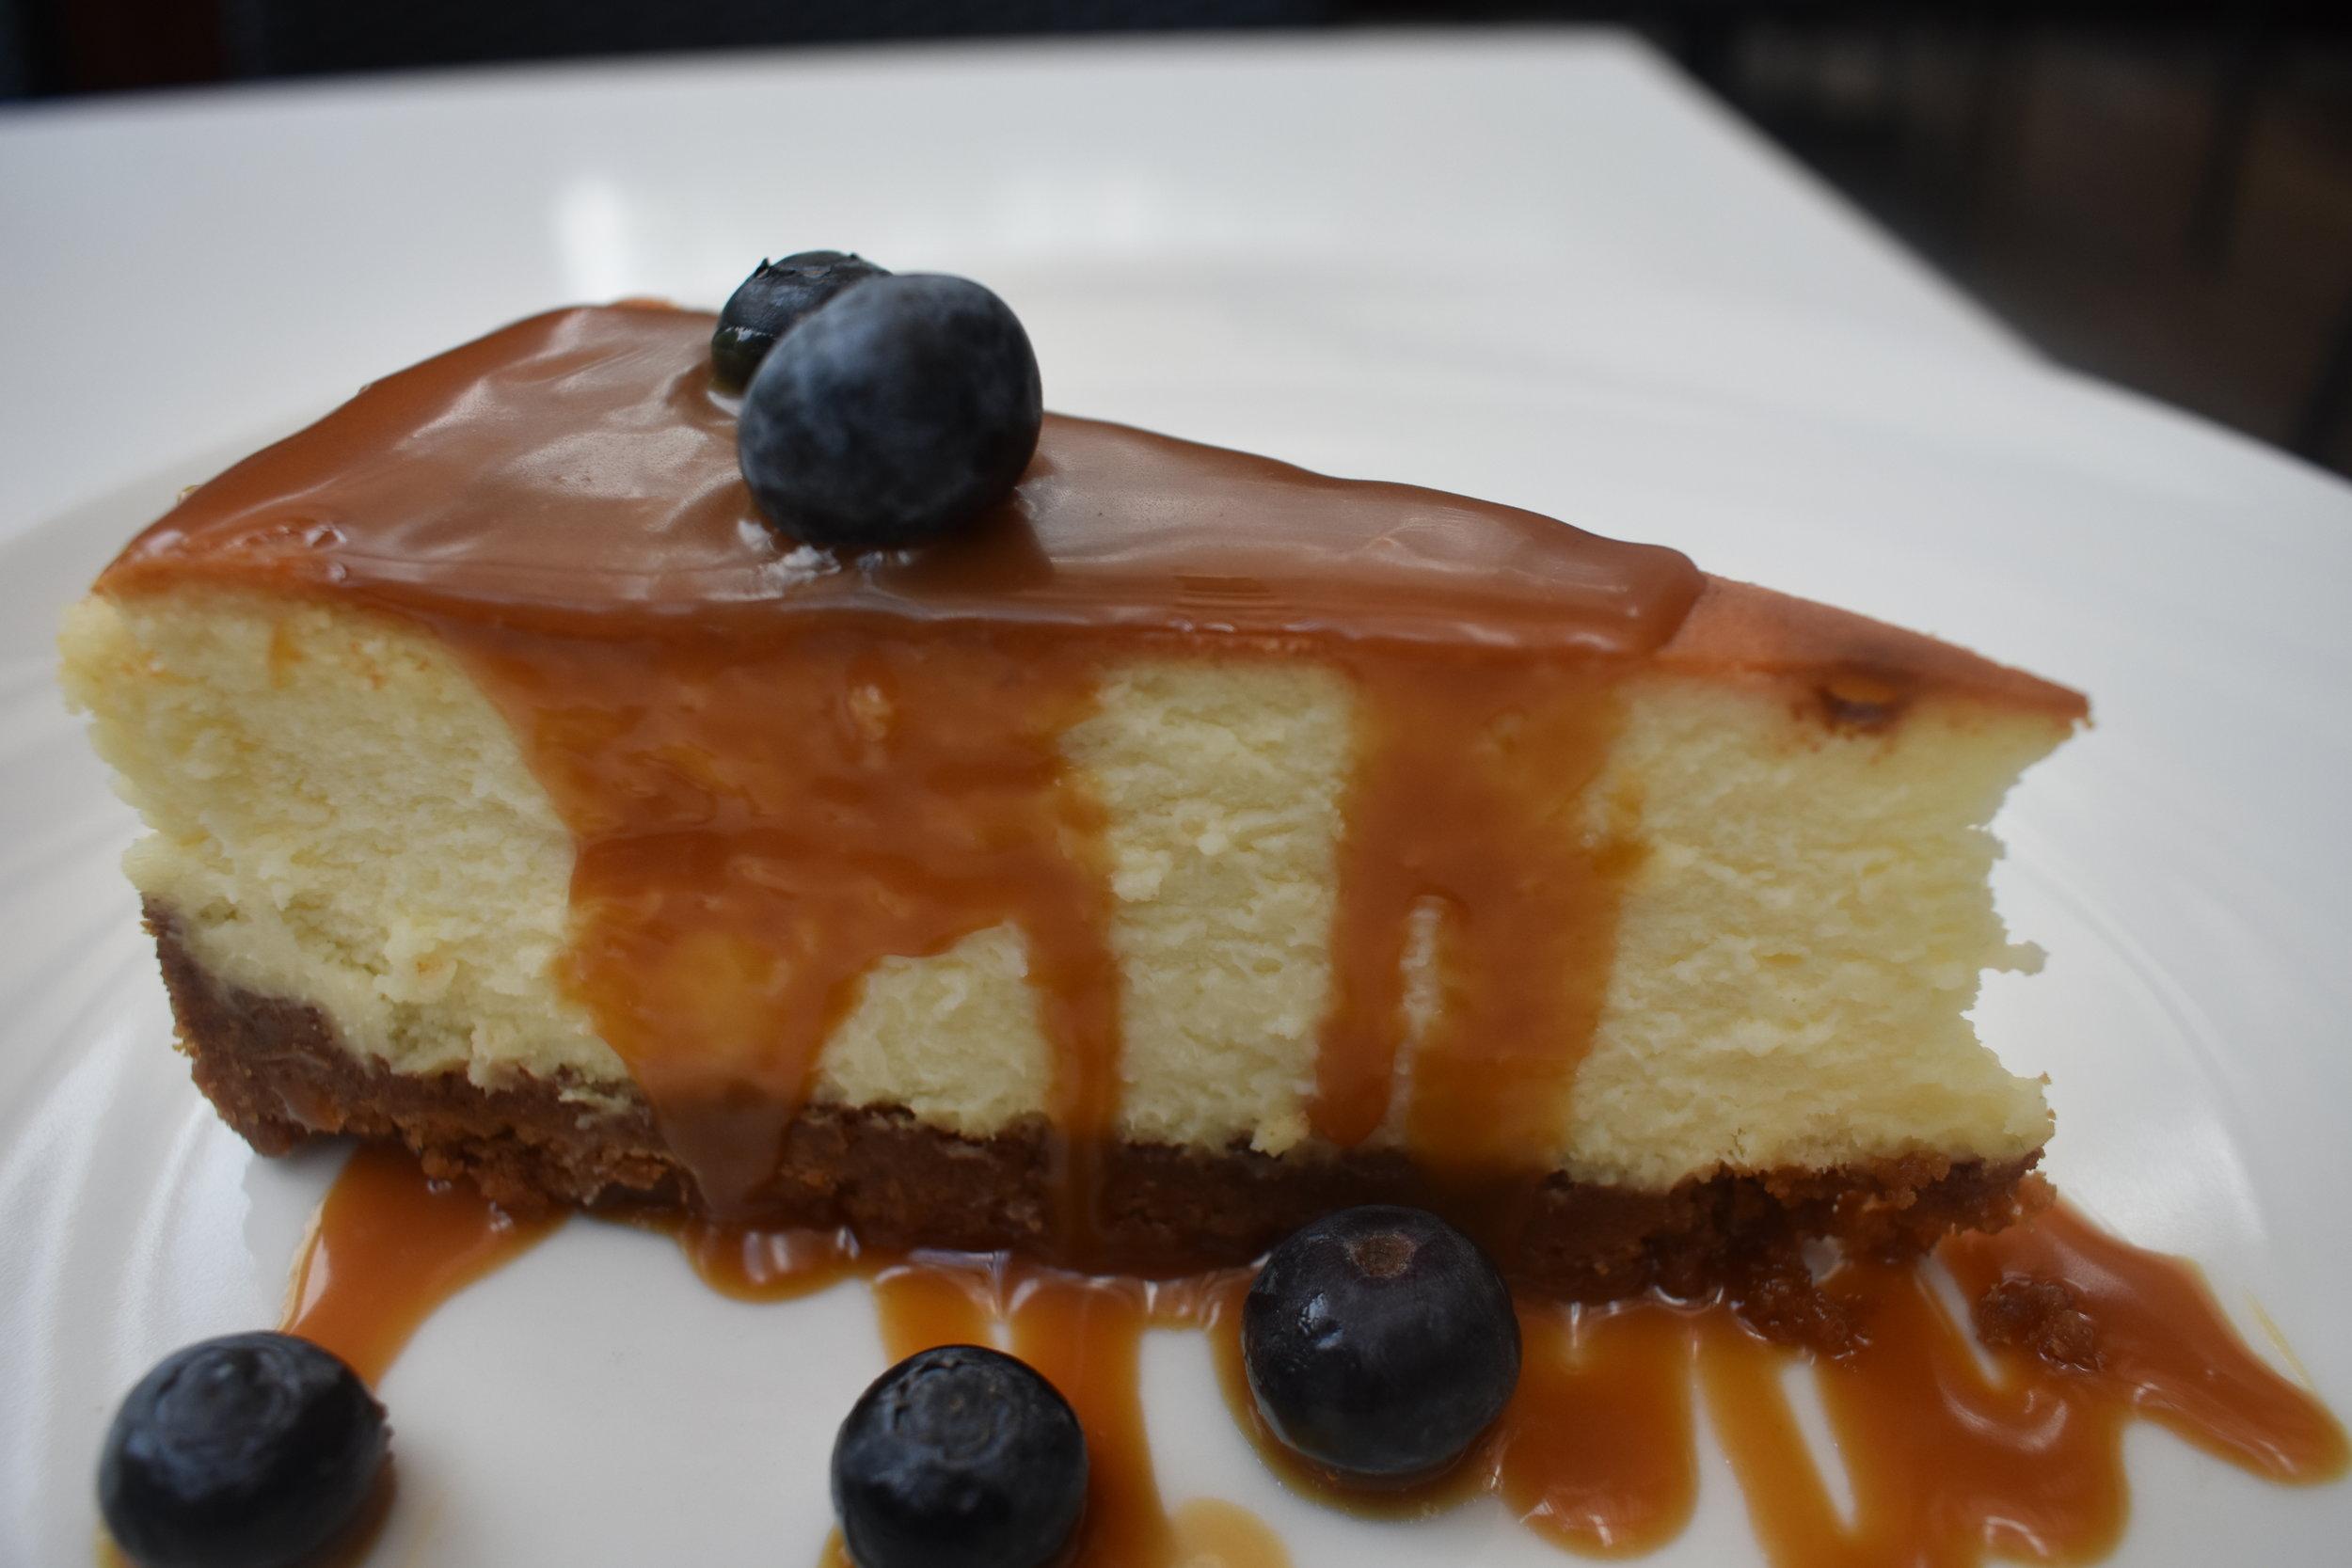 cheesecake8.JPG